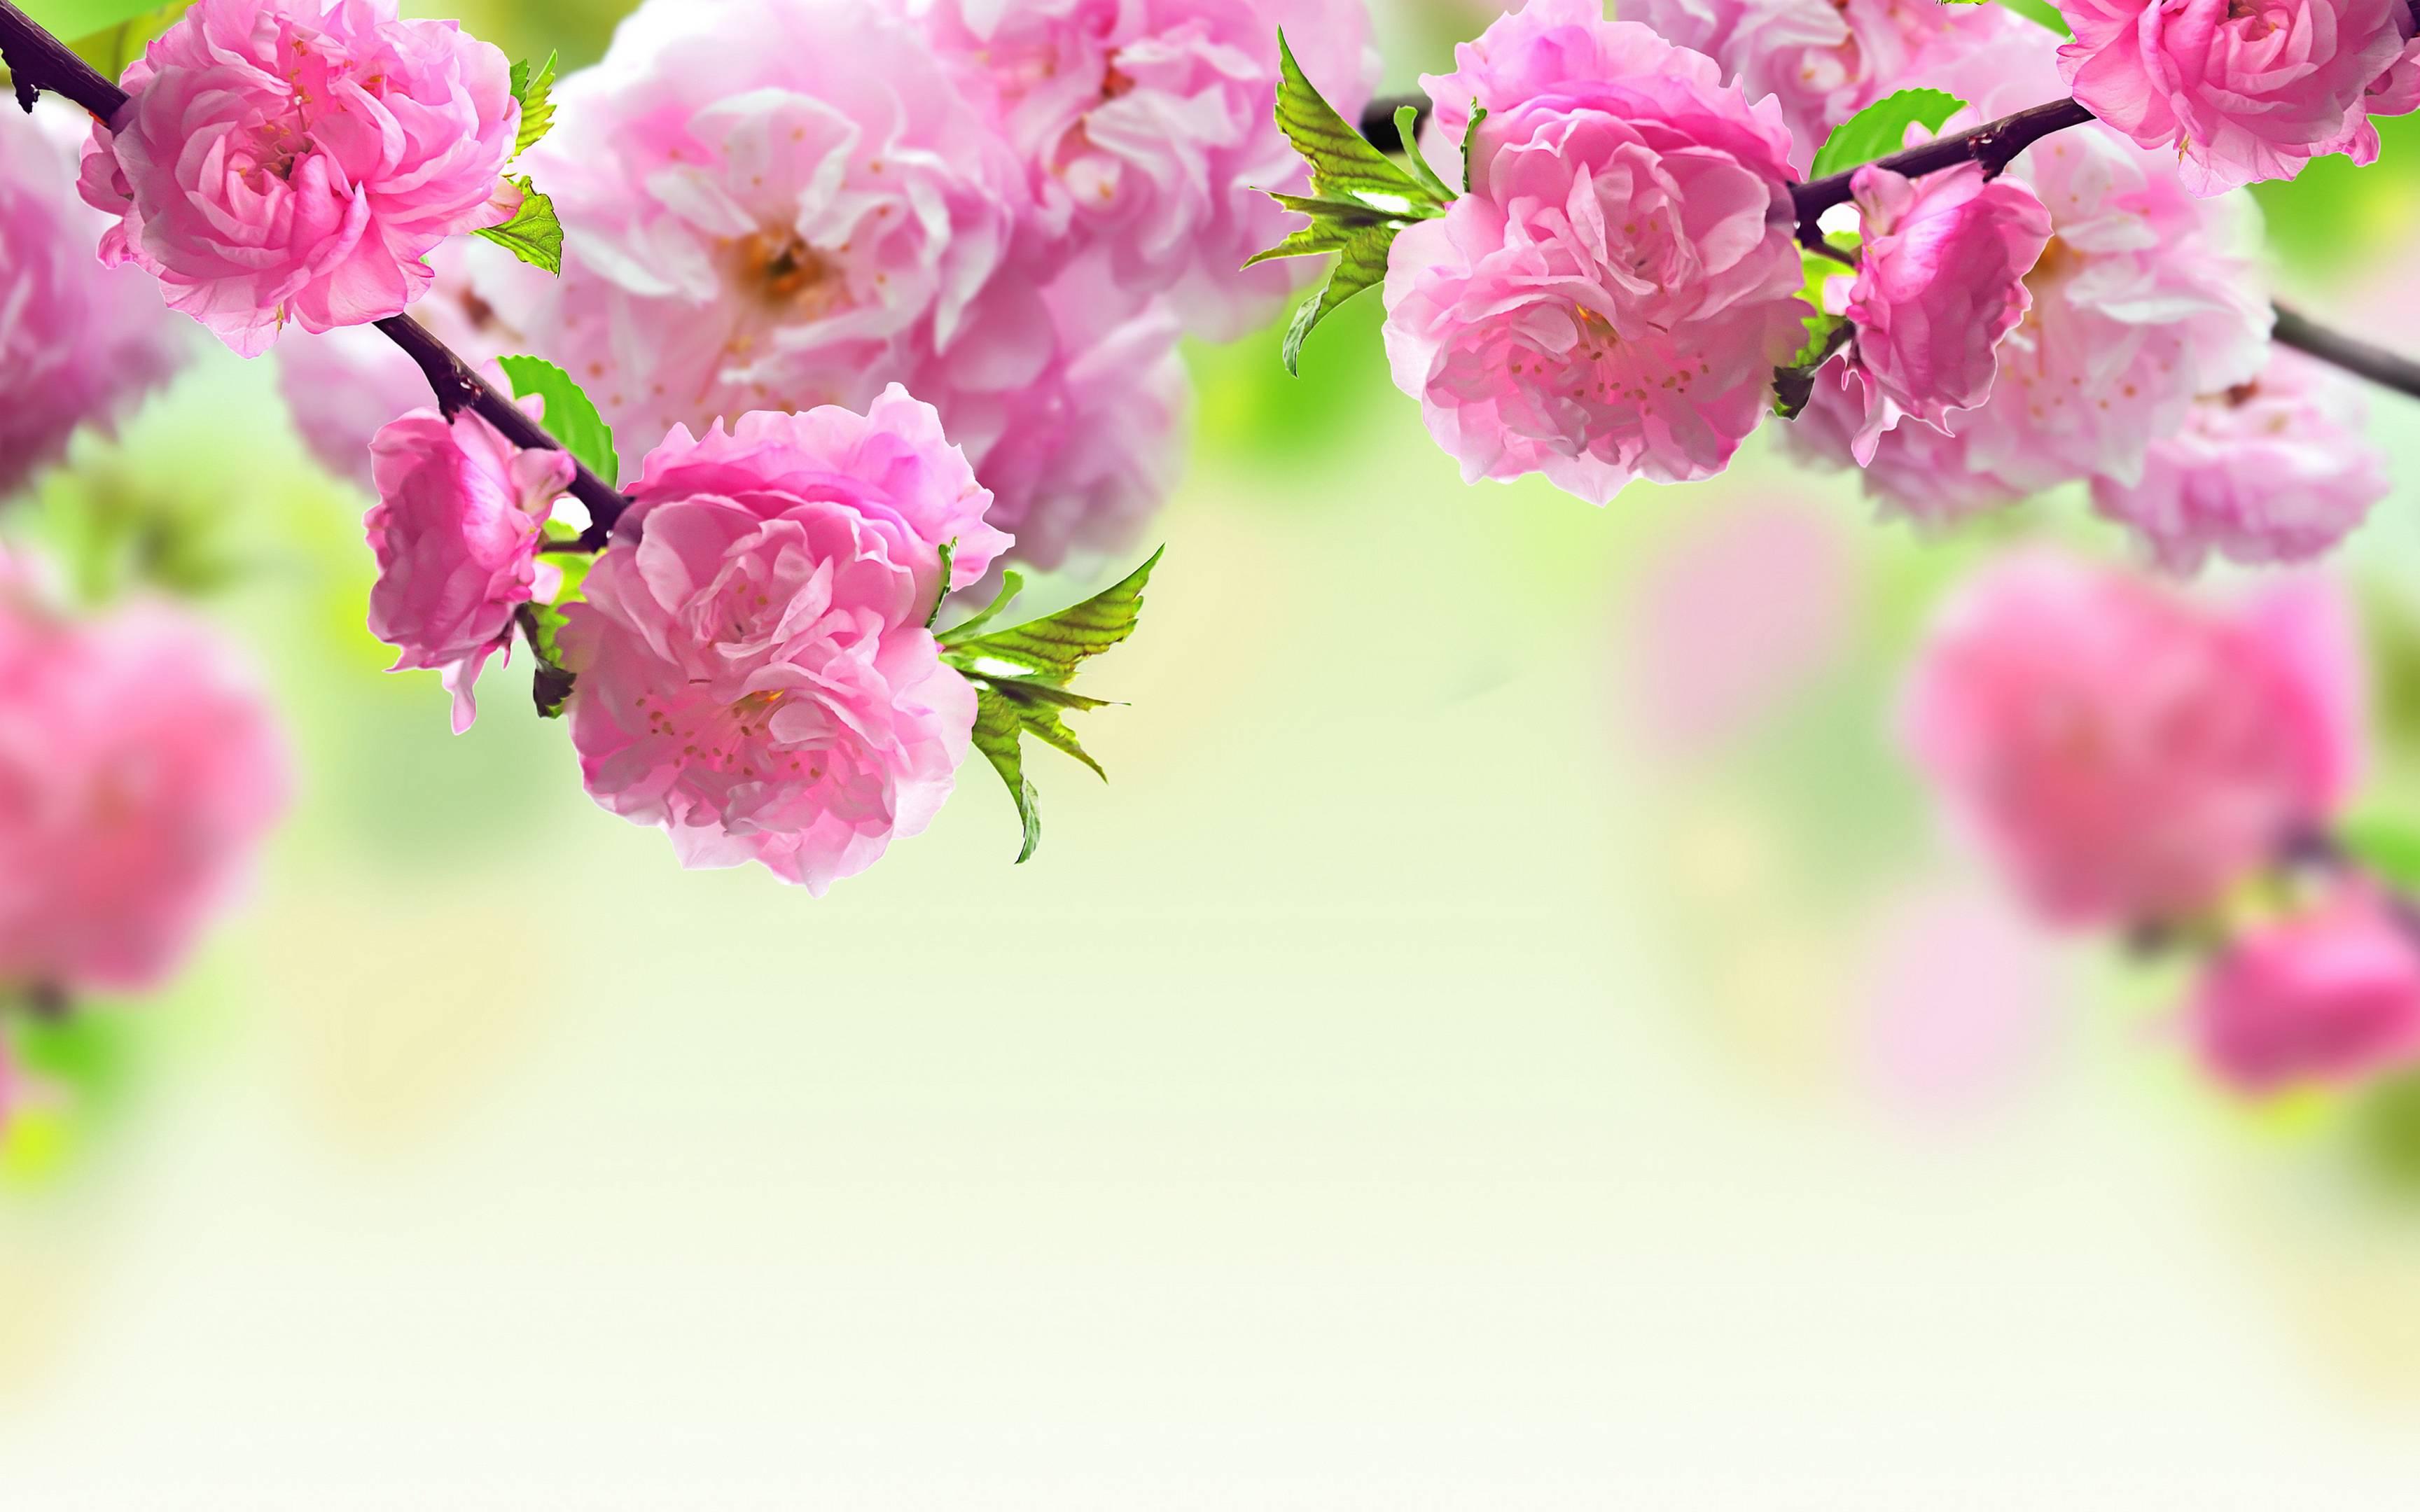 Spring Flower Wallpaper Backgrounds.